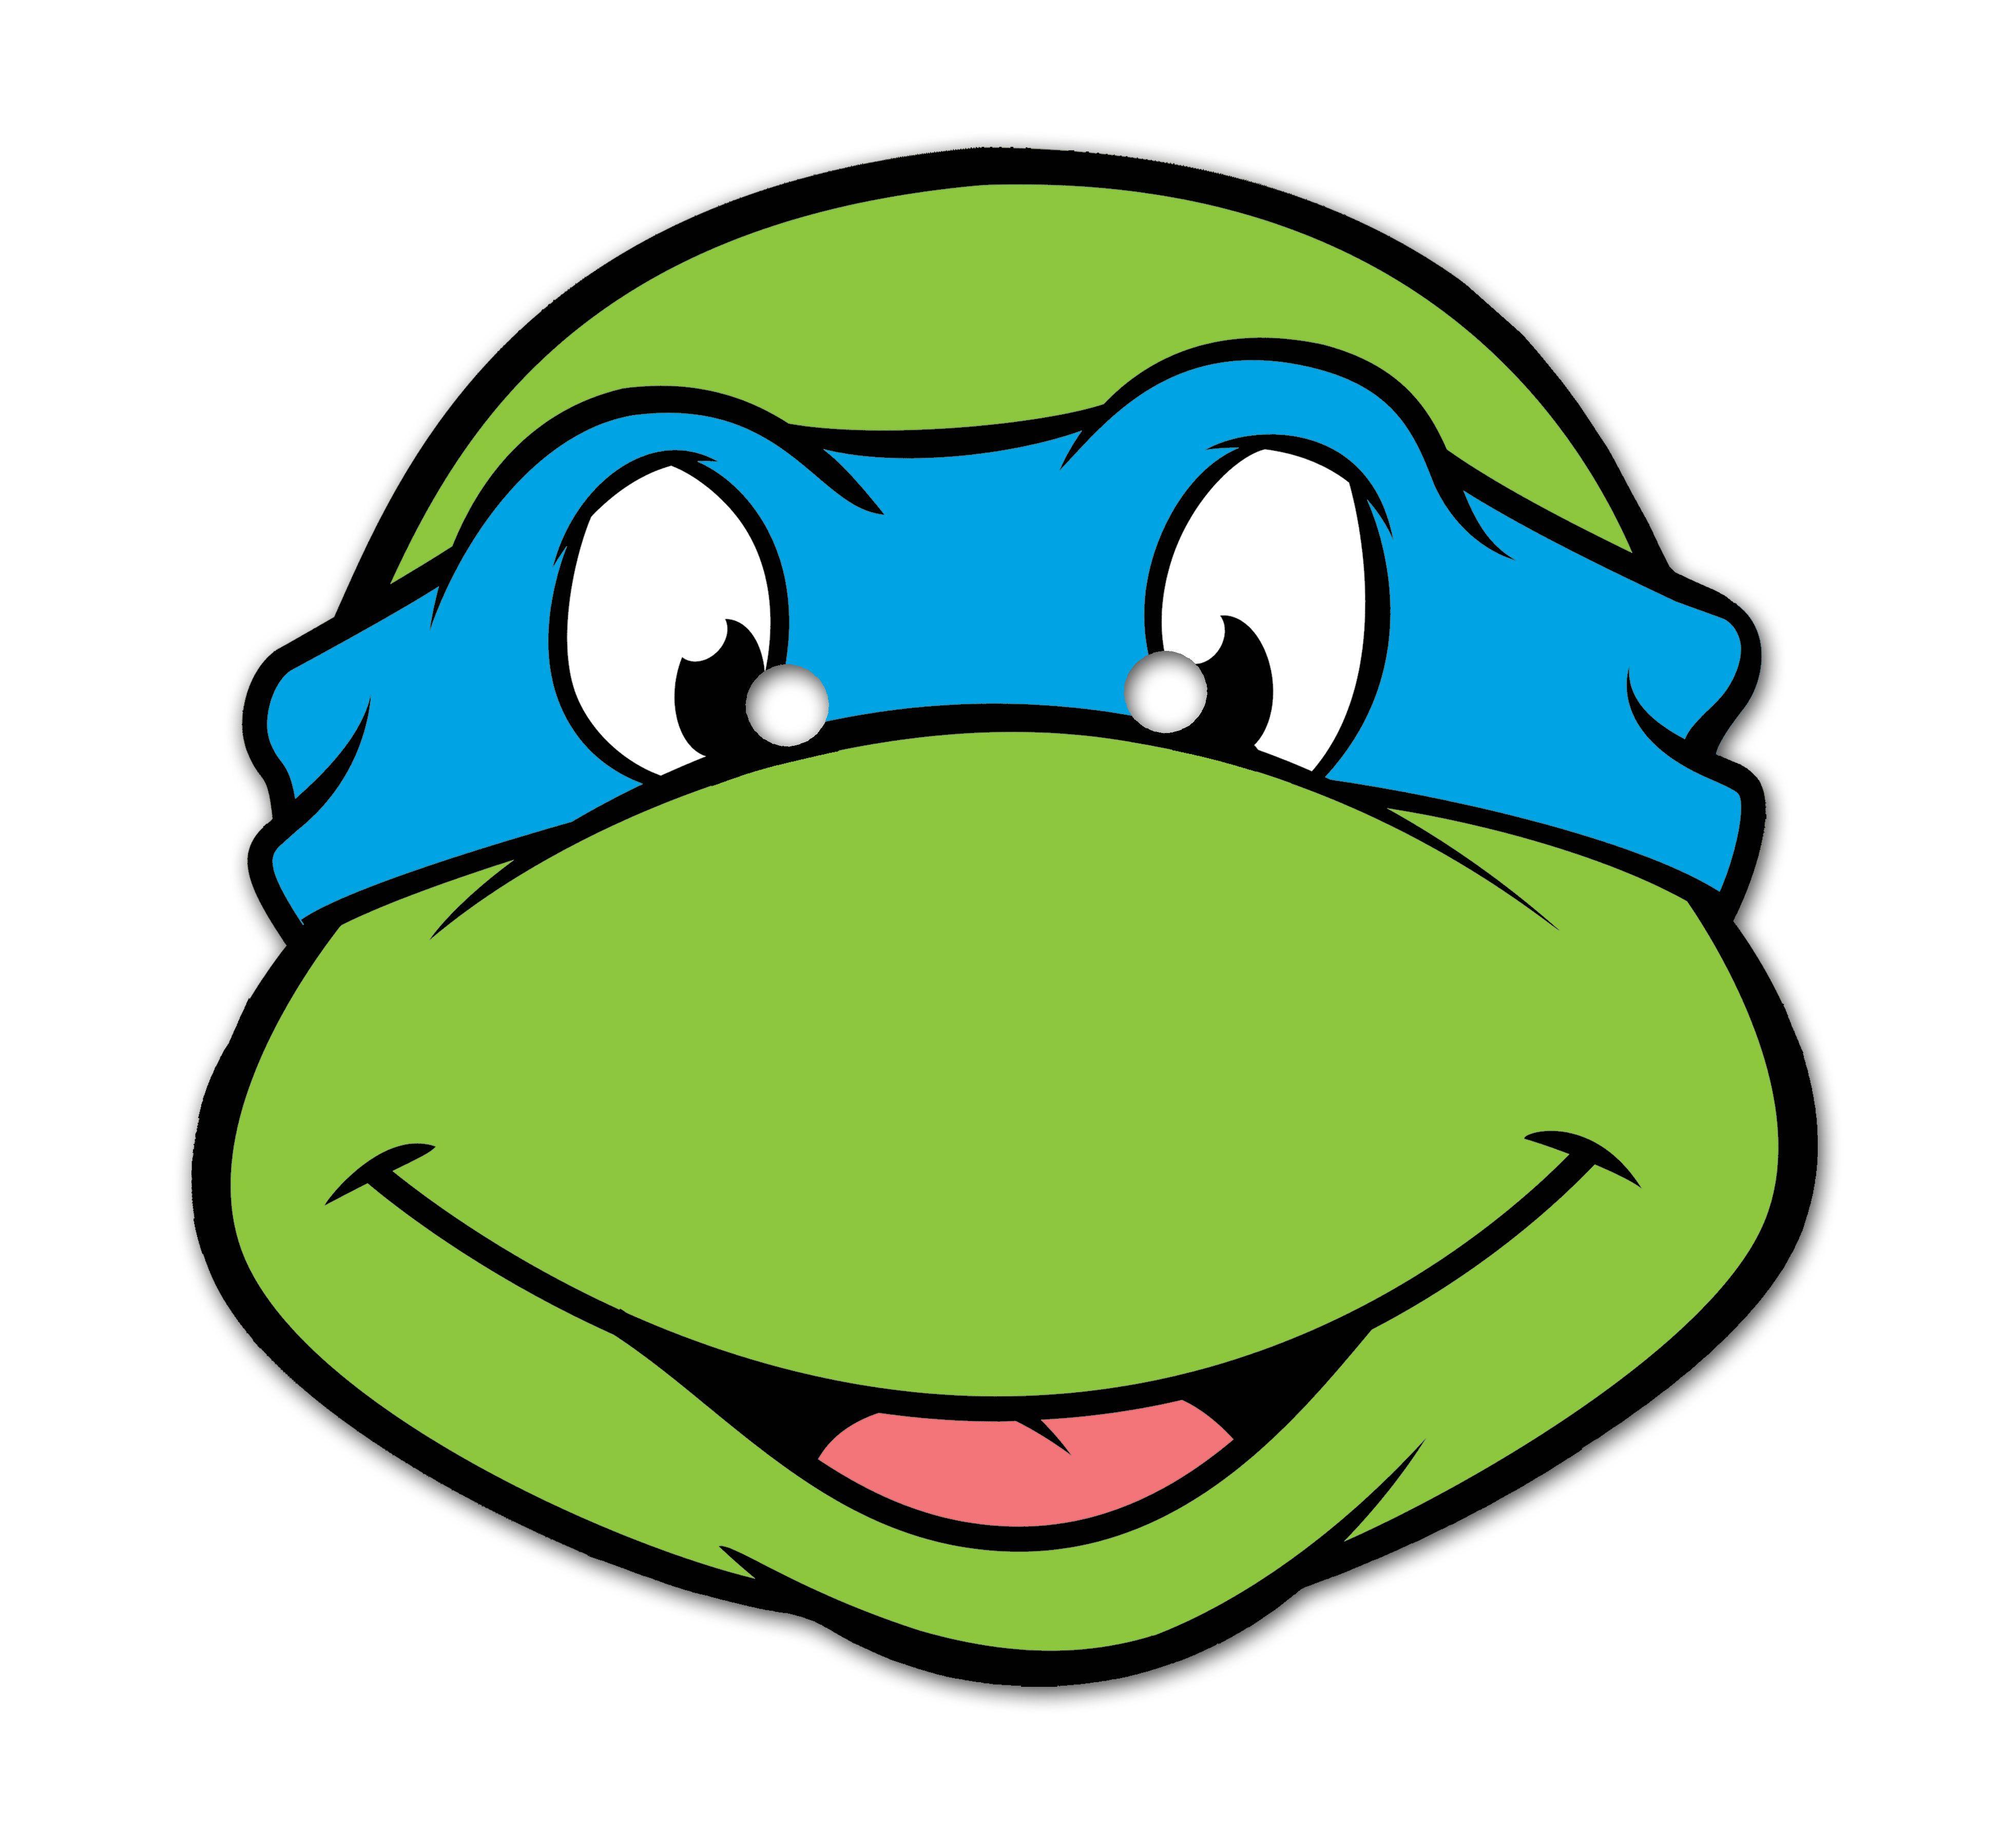 Vector Ninja Turtle An Images Hub ClipArt Best